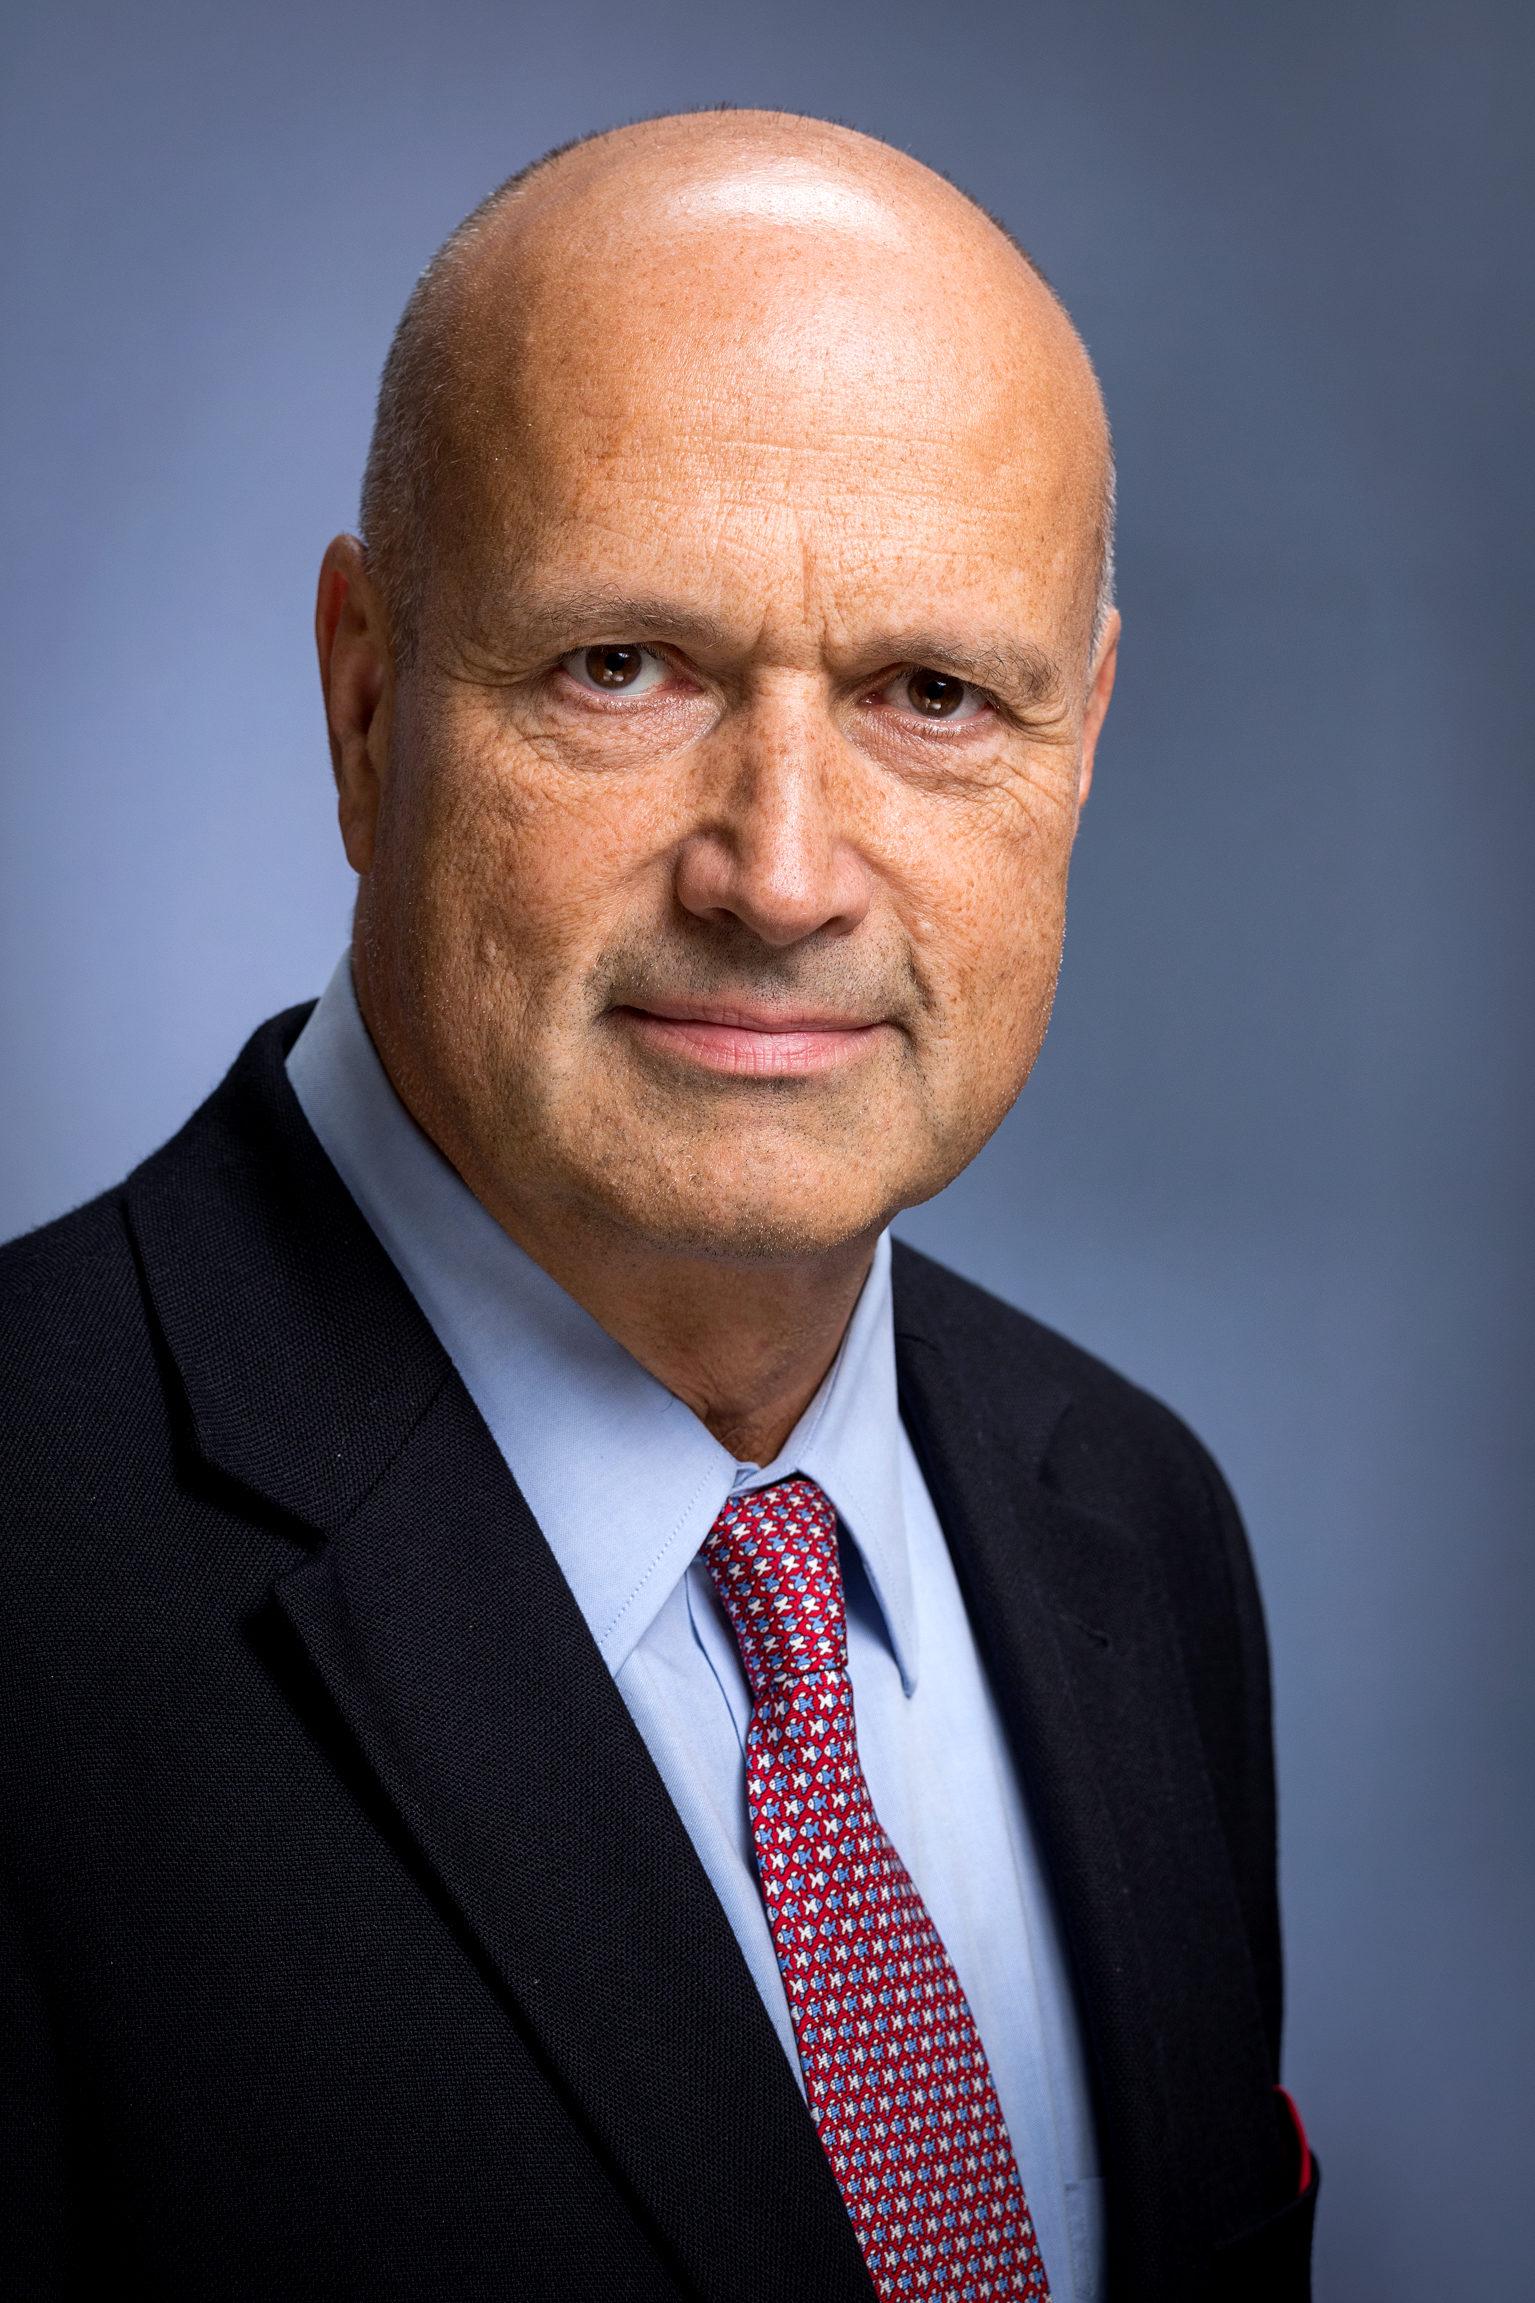 Profesor Pavel Calda